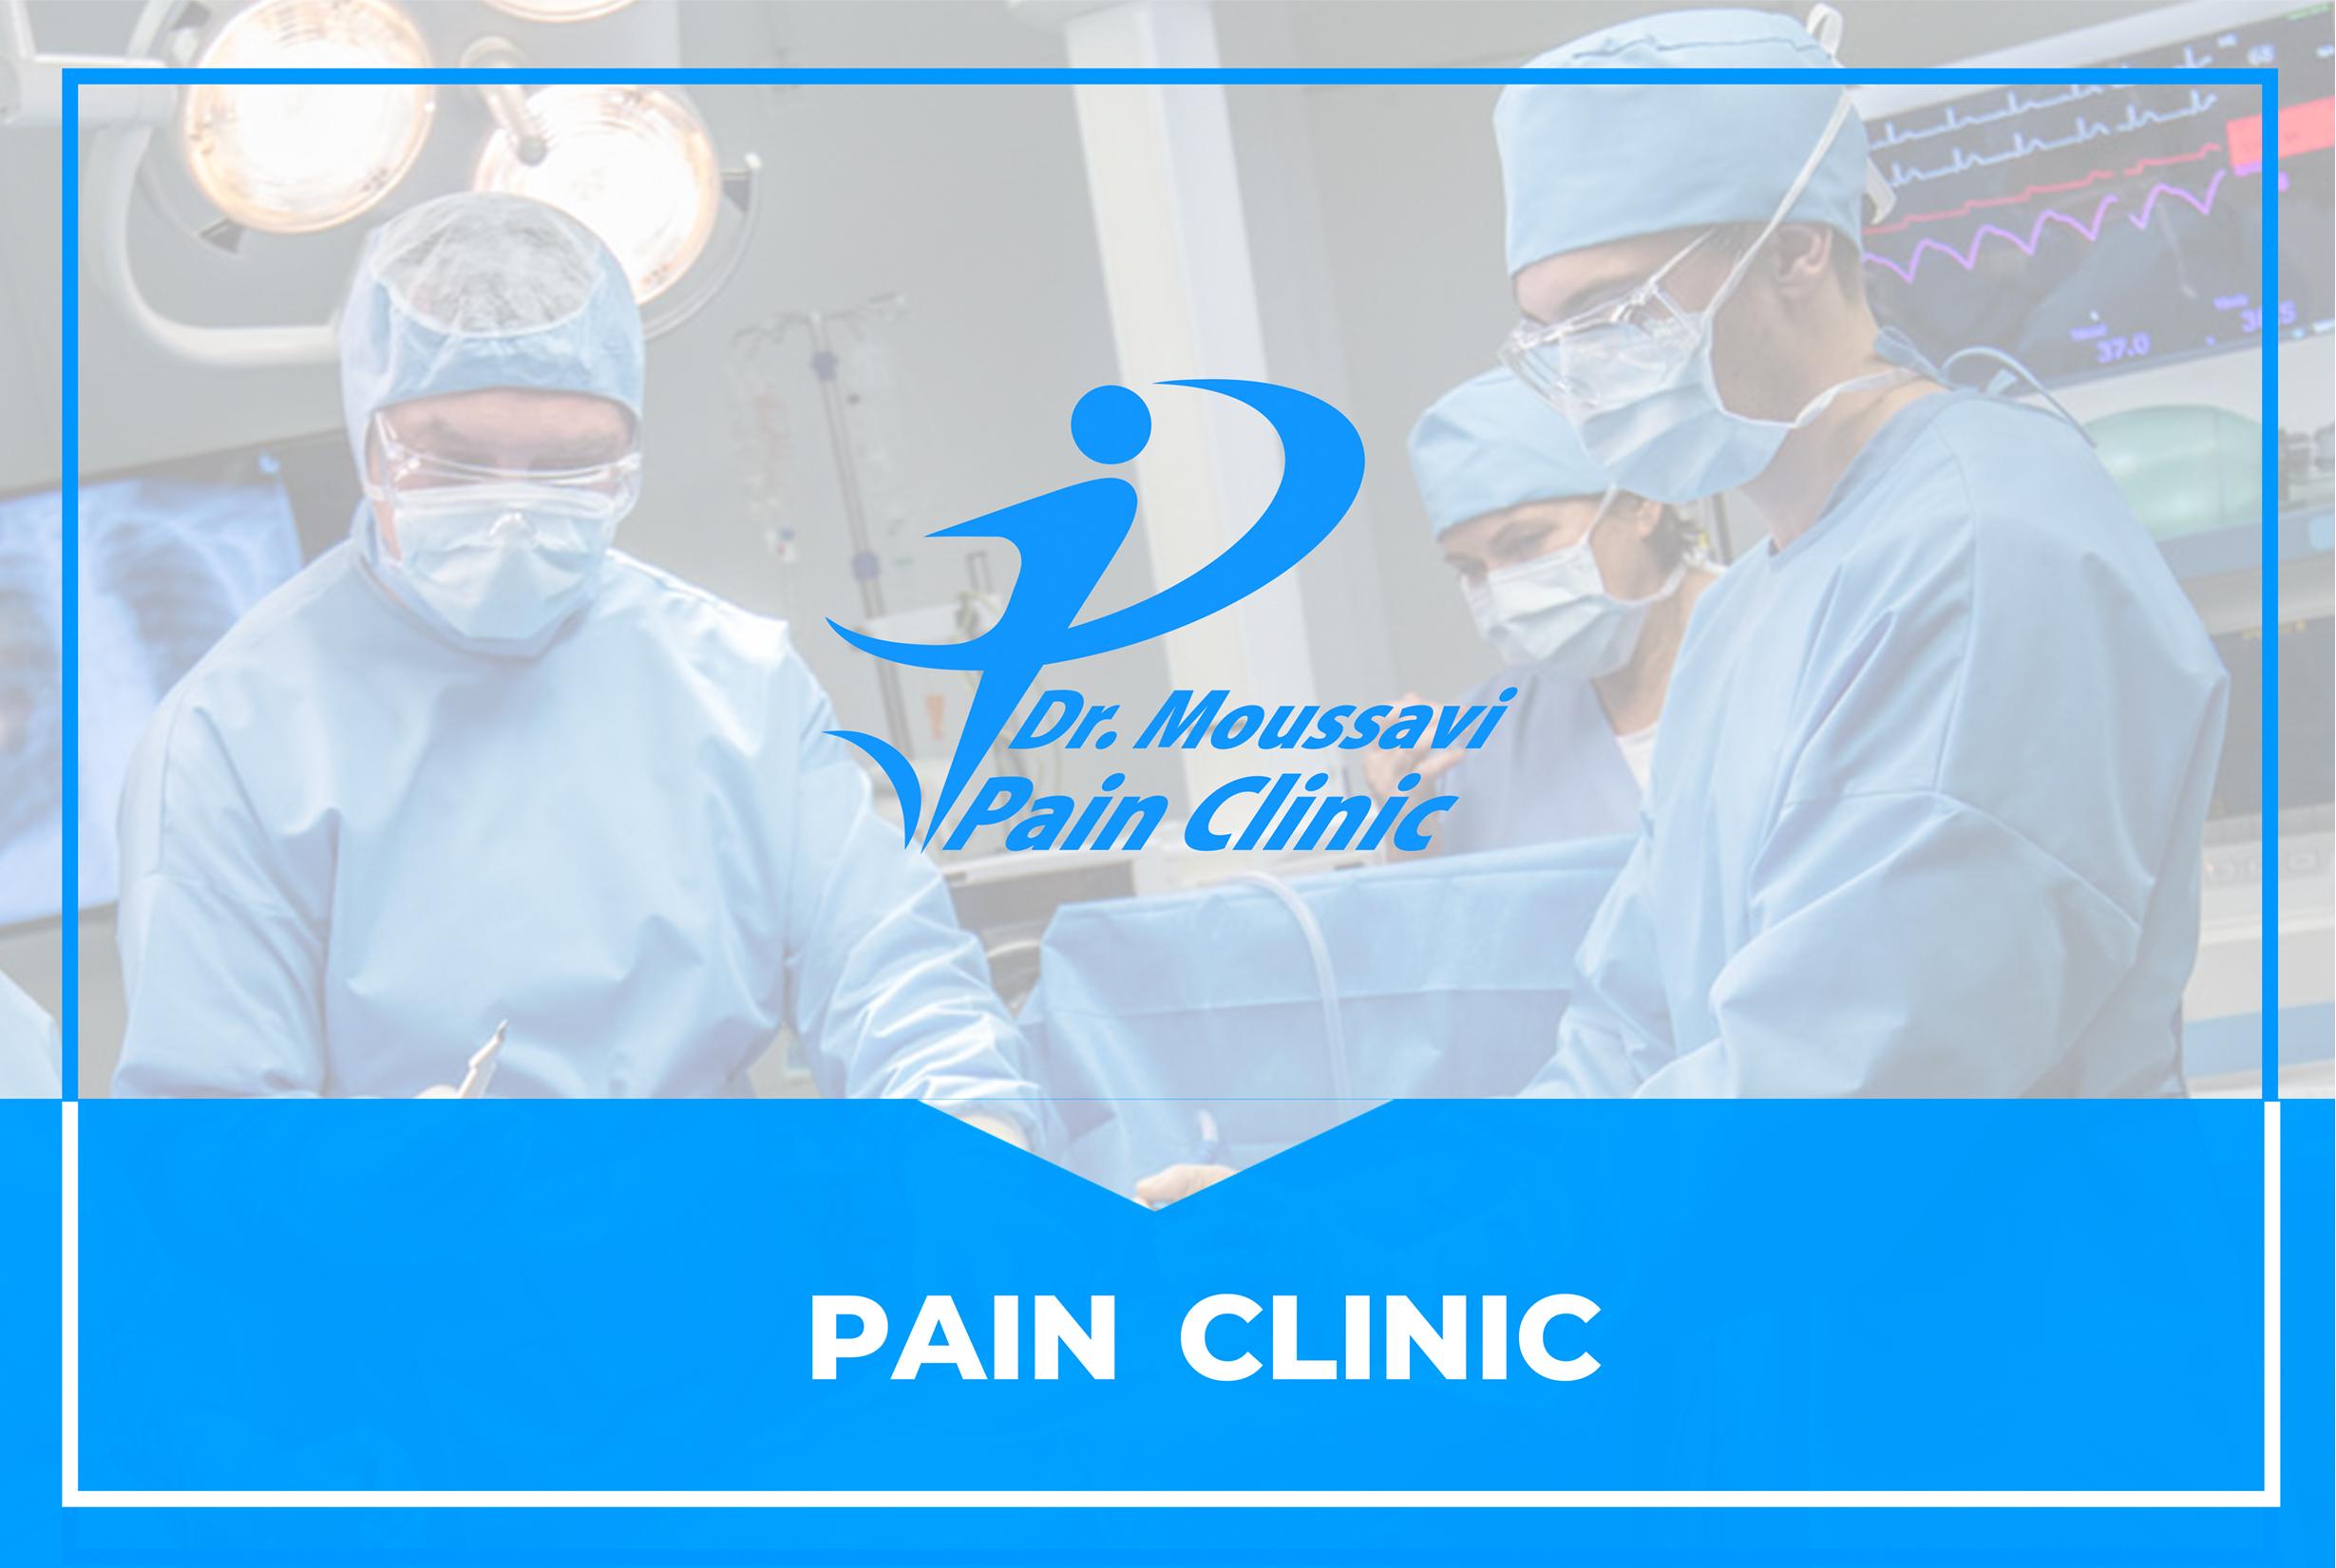 کلینیک درد چیست؟